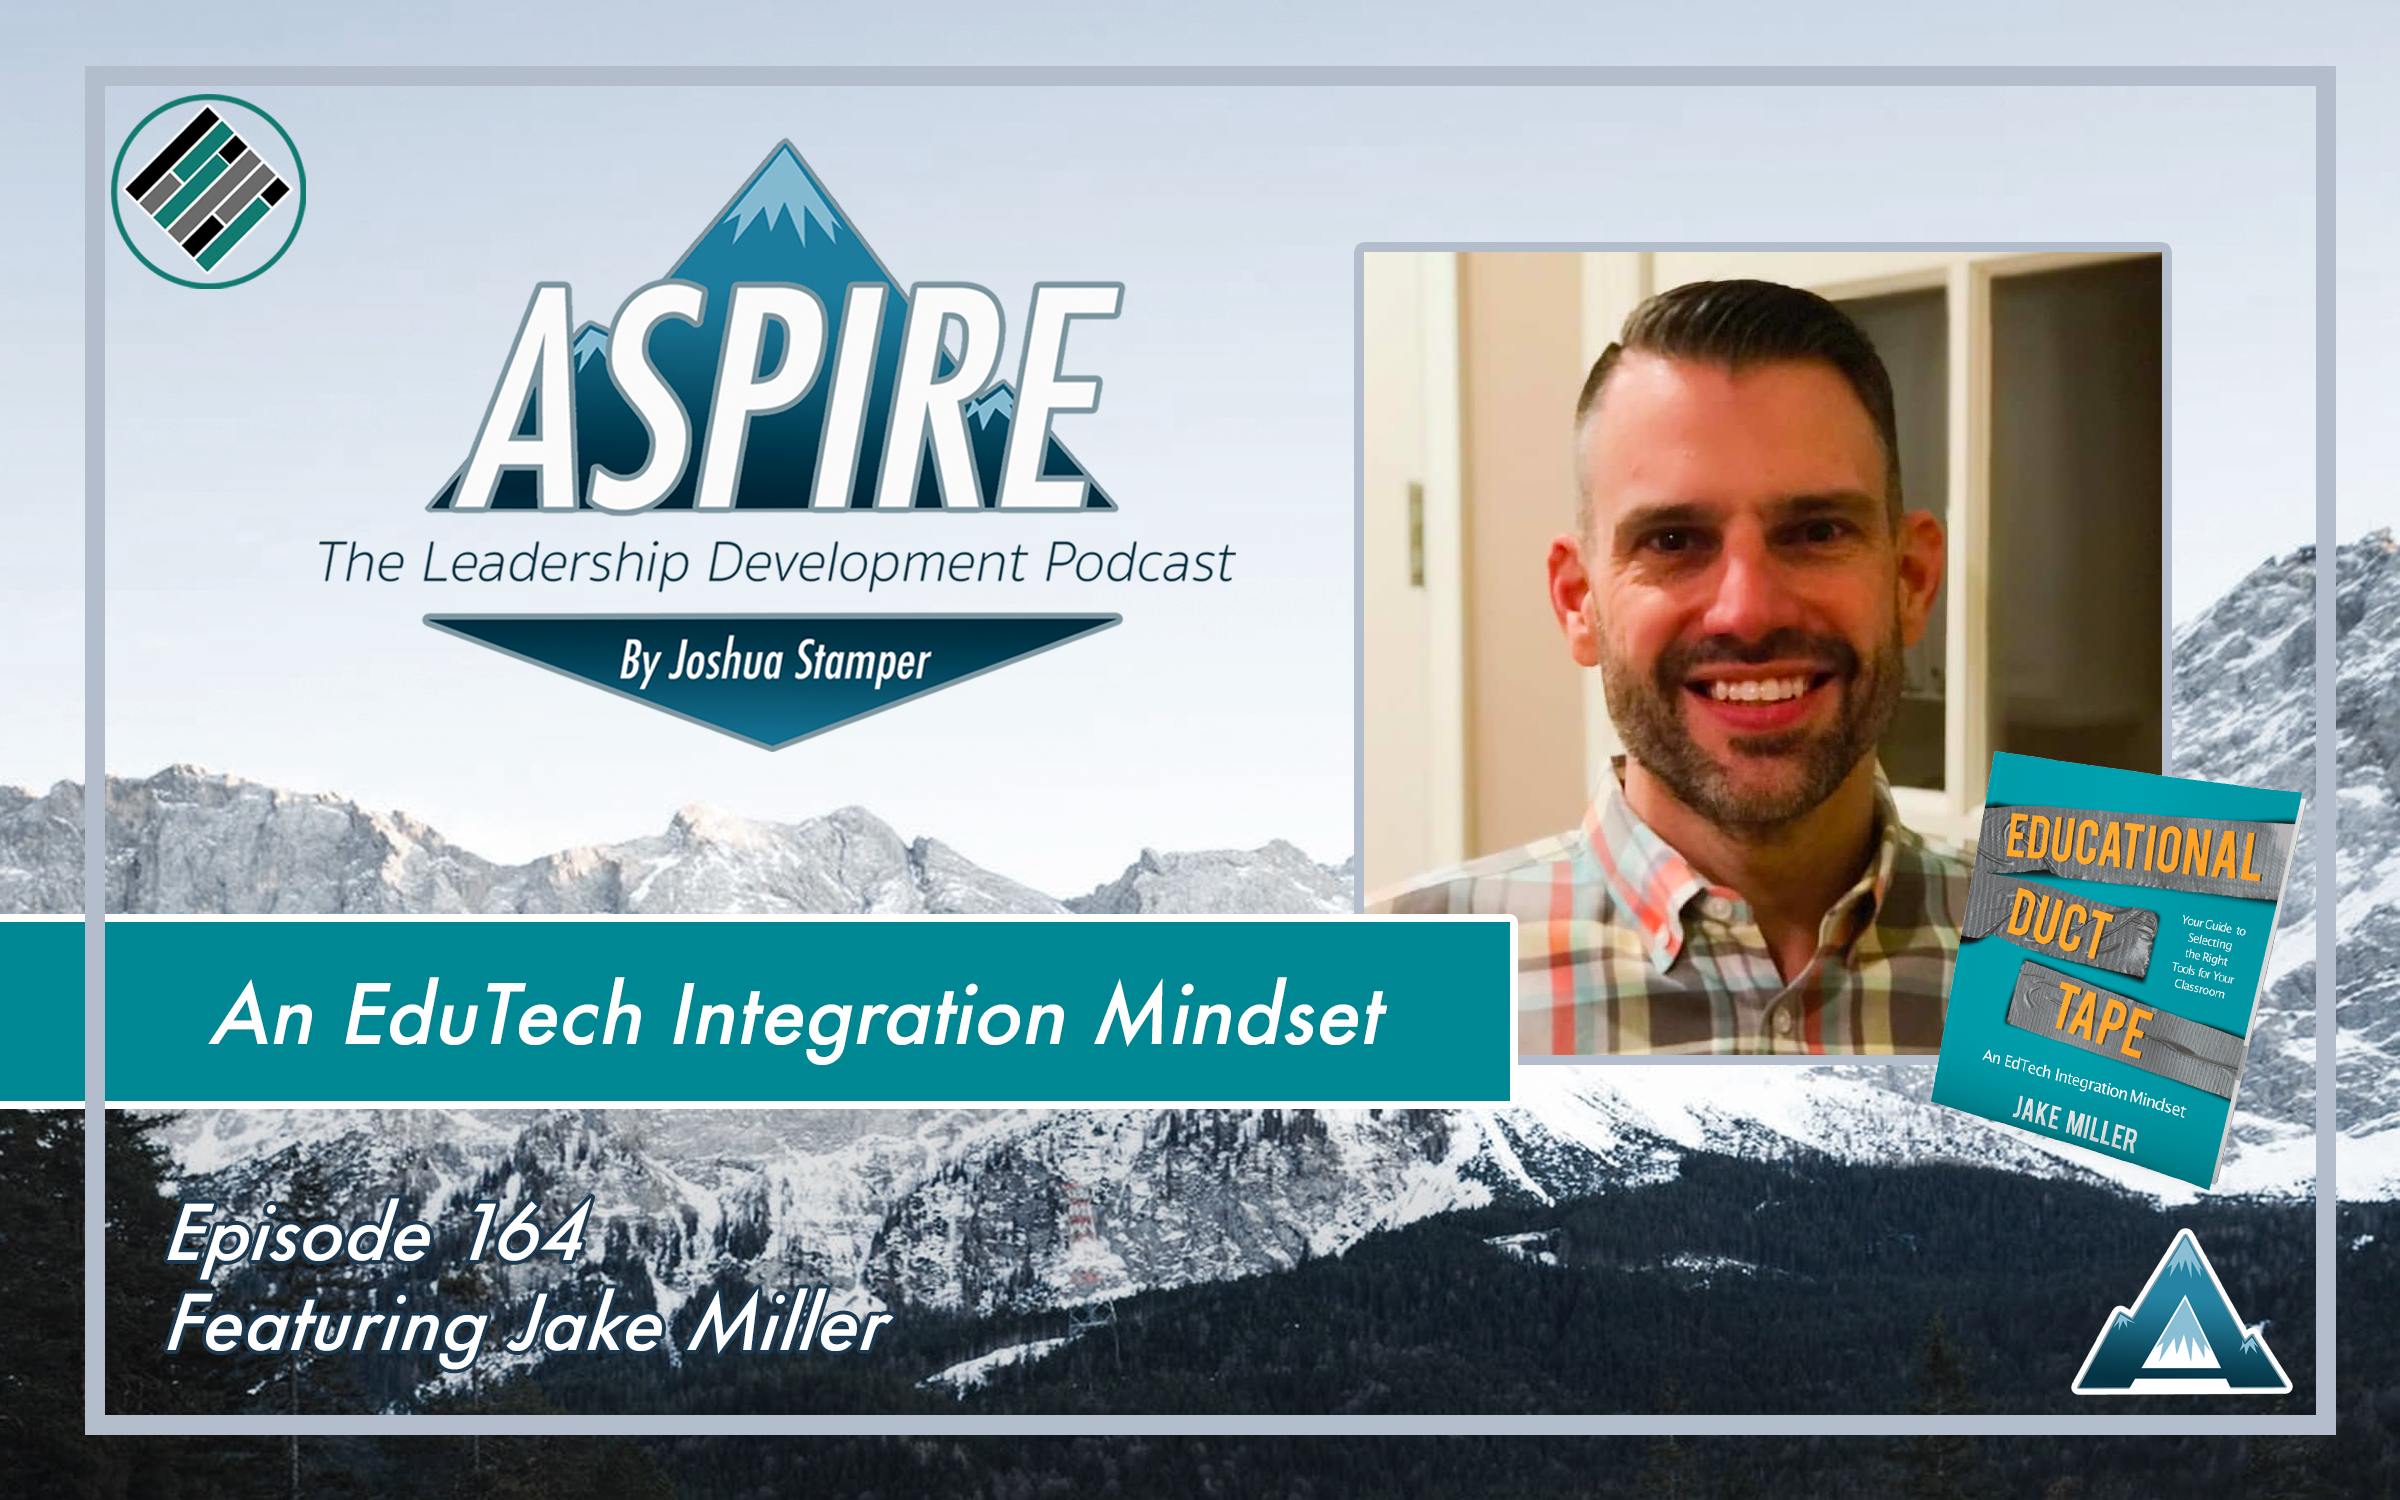 Jake Miller, Joshua Stamper, Aspire: The Leadership Development Podcast, #AspireLead, Teach Better, Educational Duct Tape